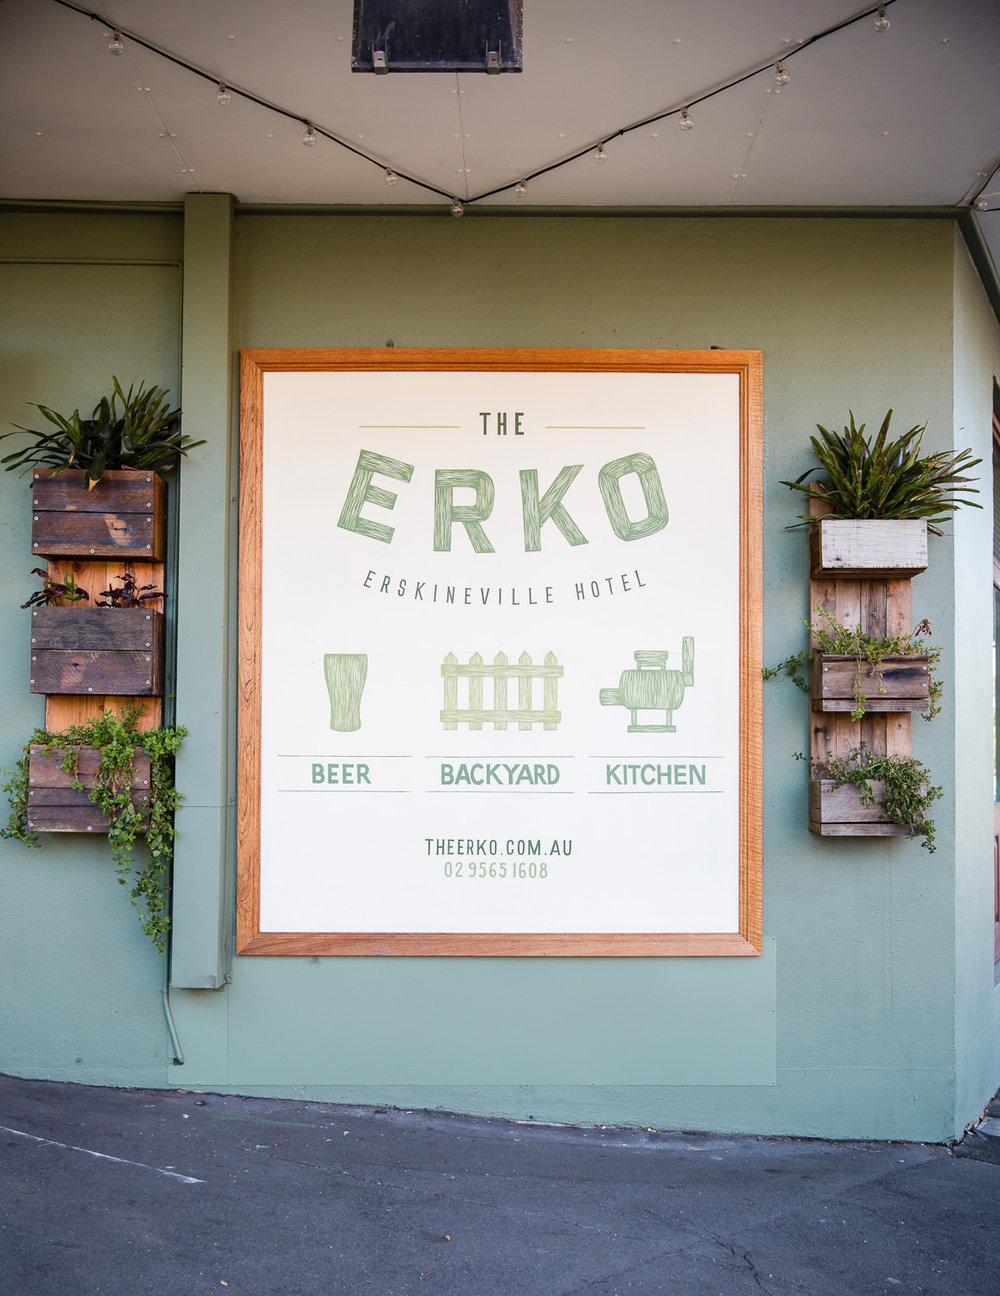 The Erko